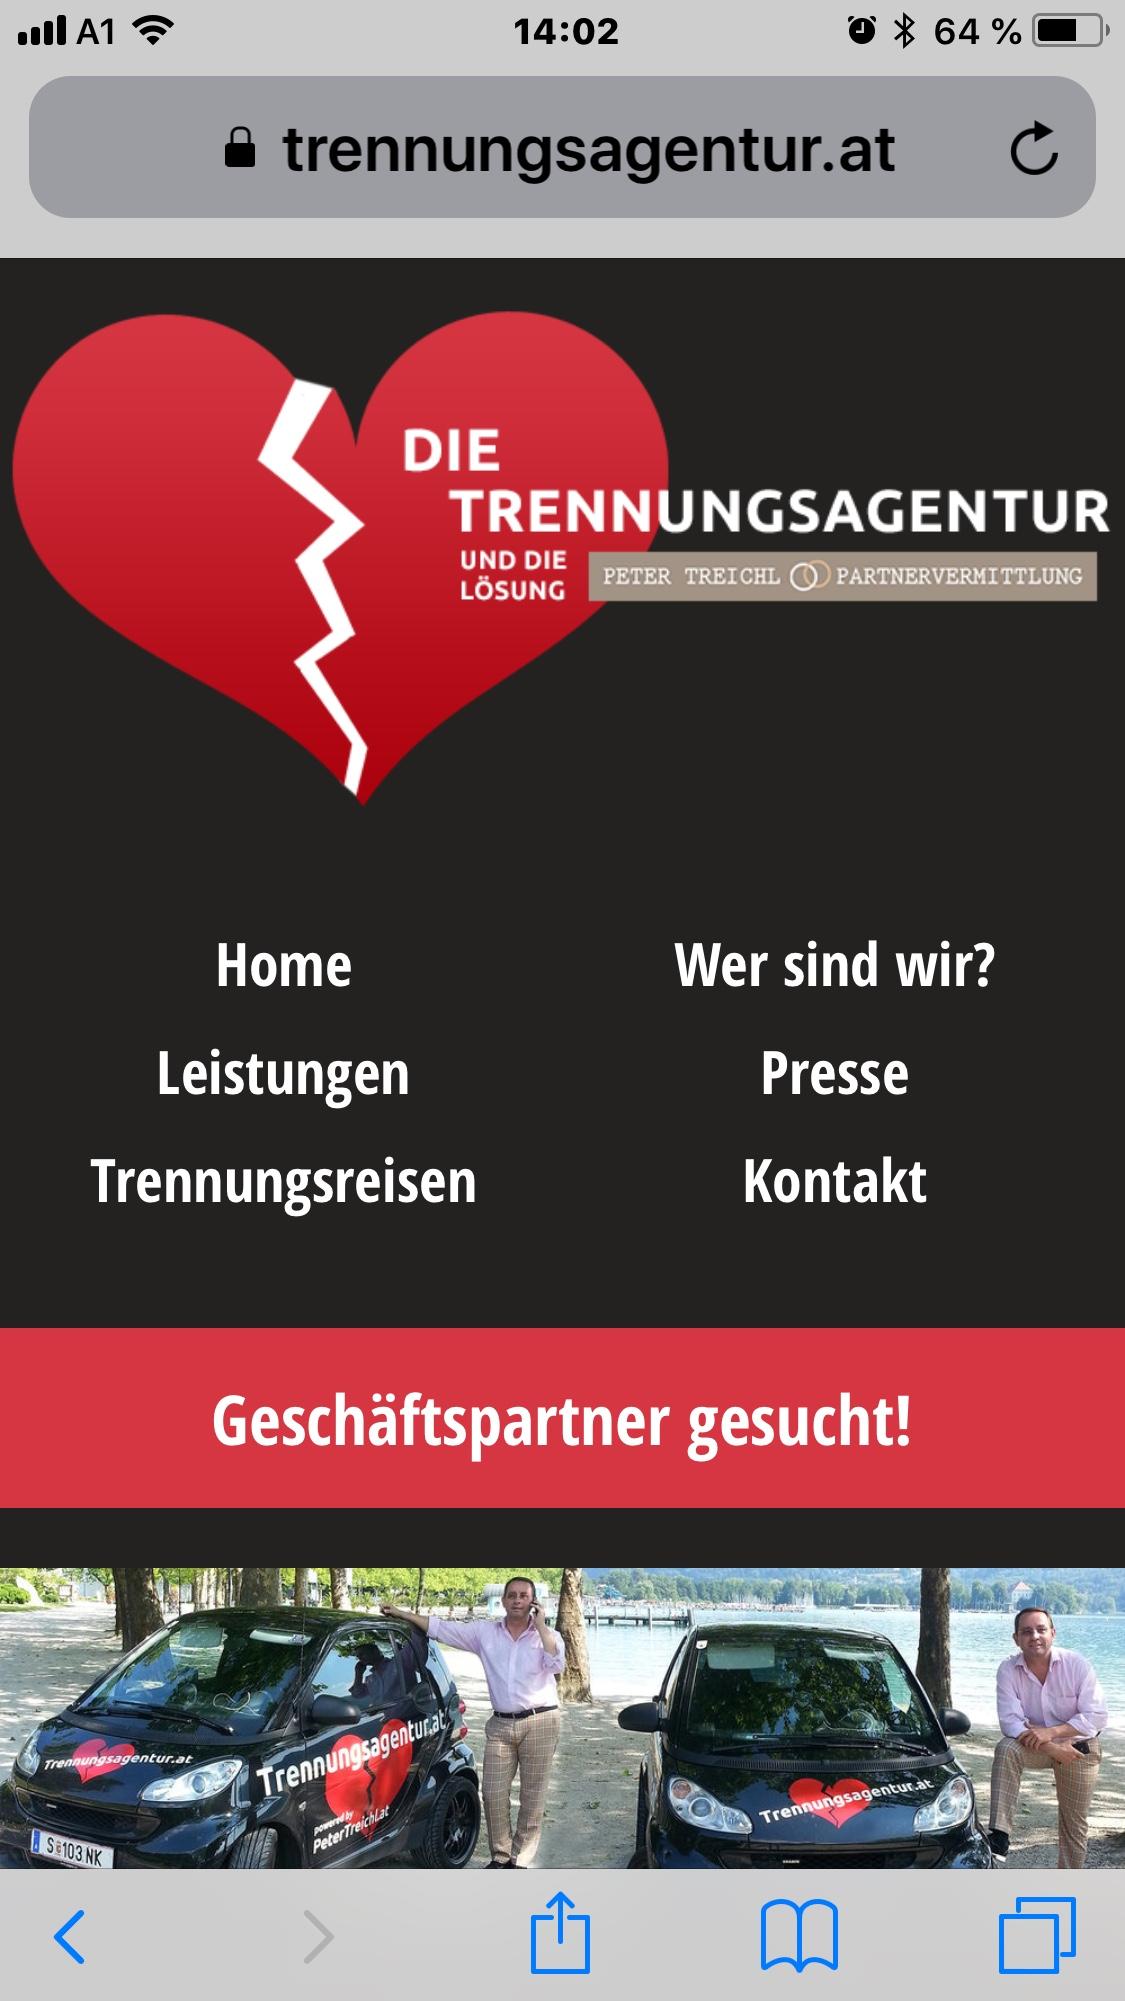 Dating events nassereith - Ww pusatxxi.com